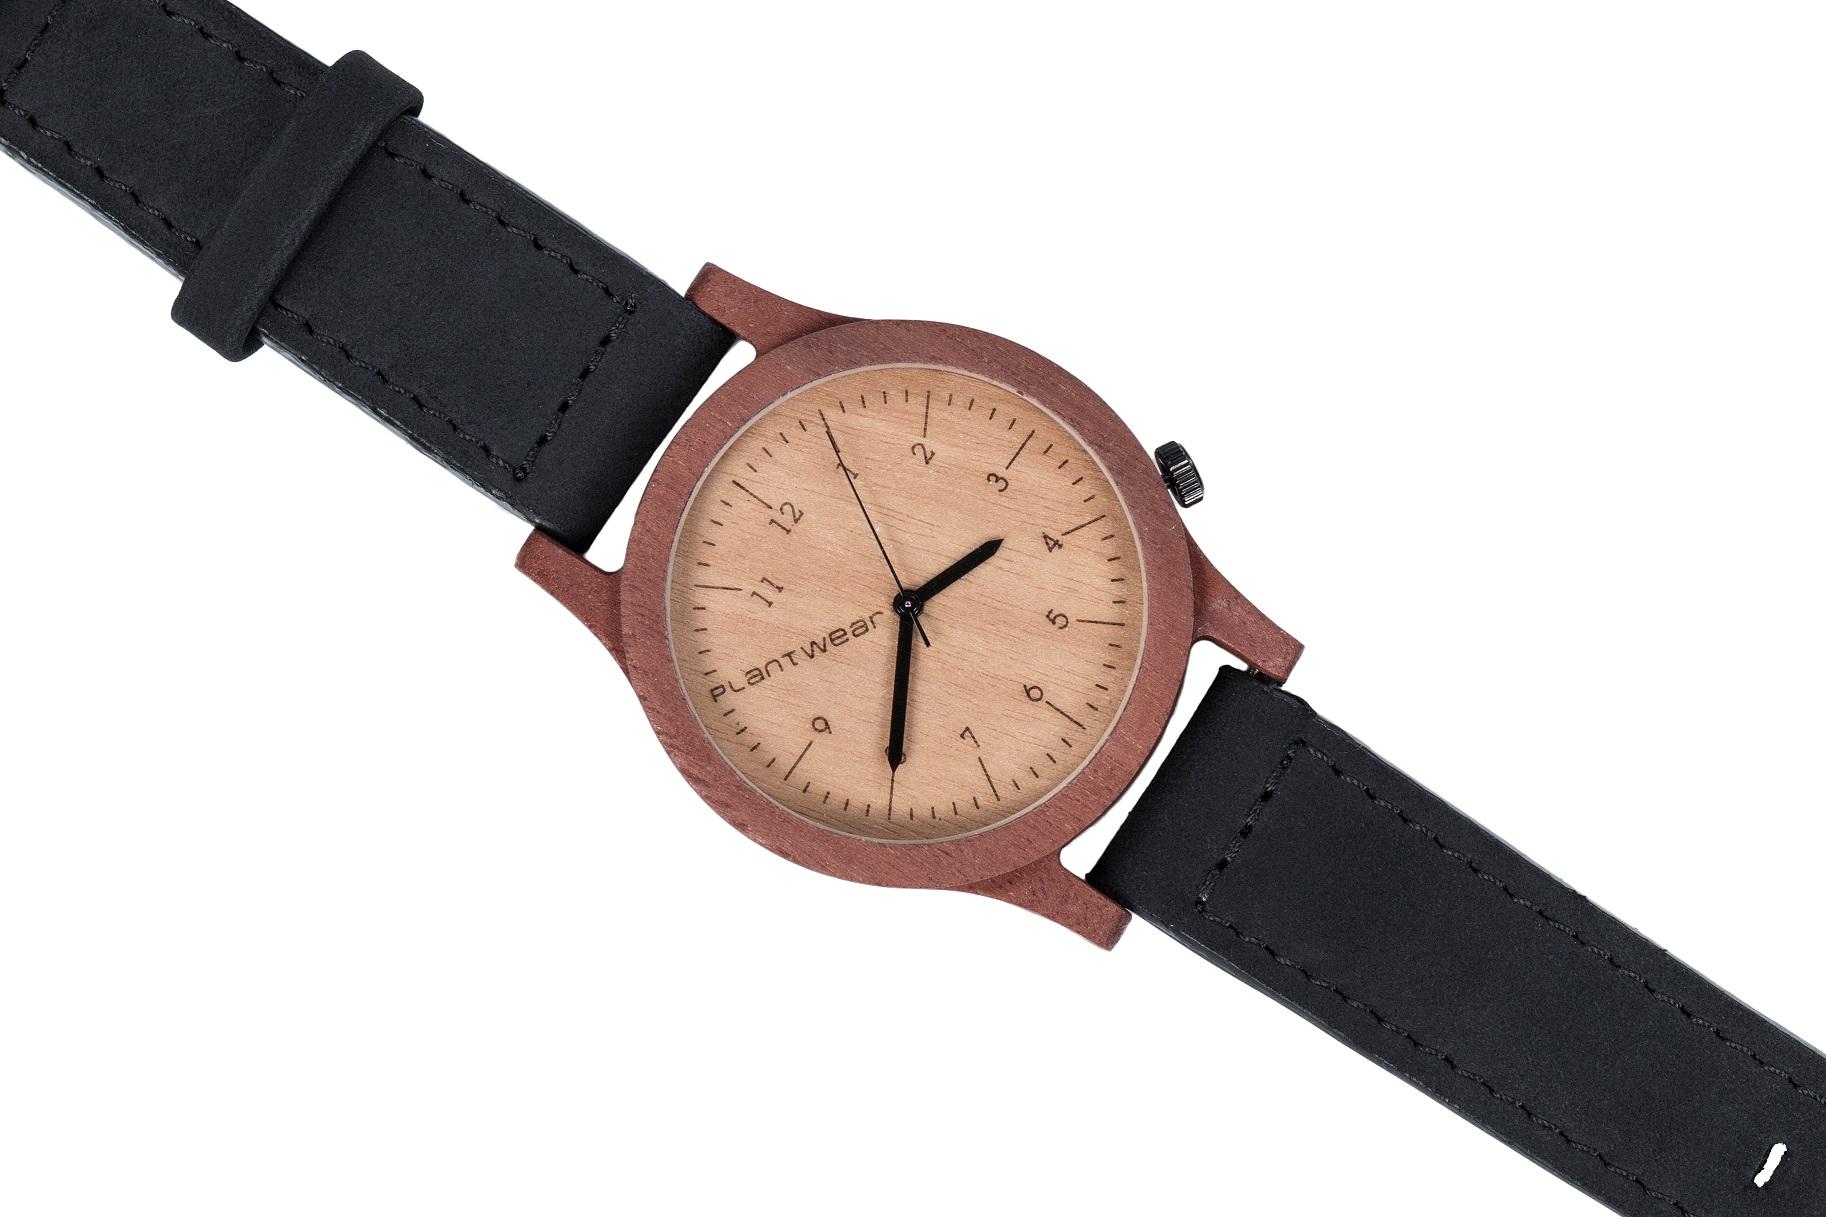 Drewniany zegarek Heritage Massaranduba 3